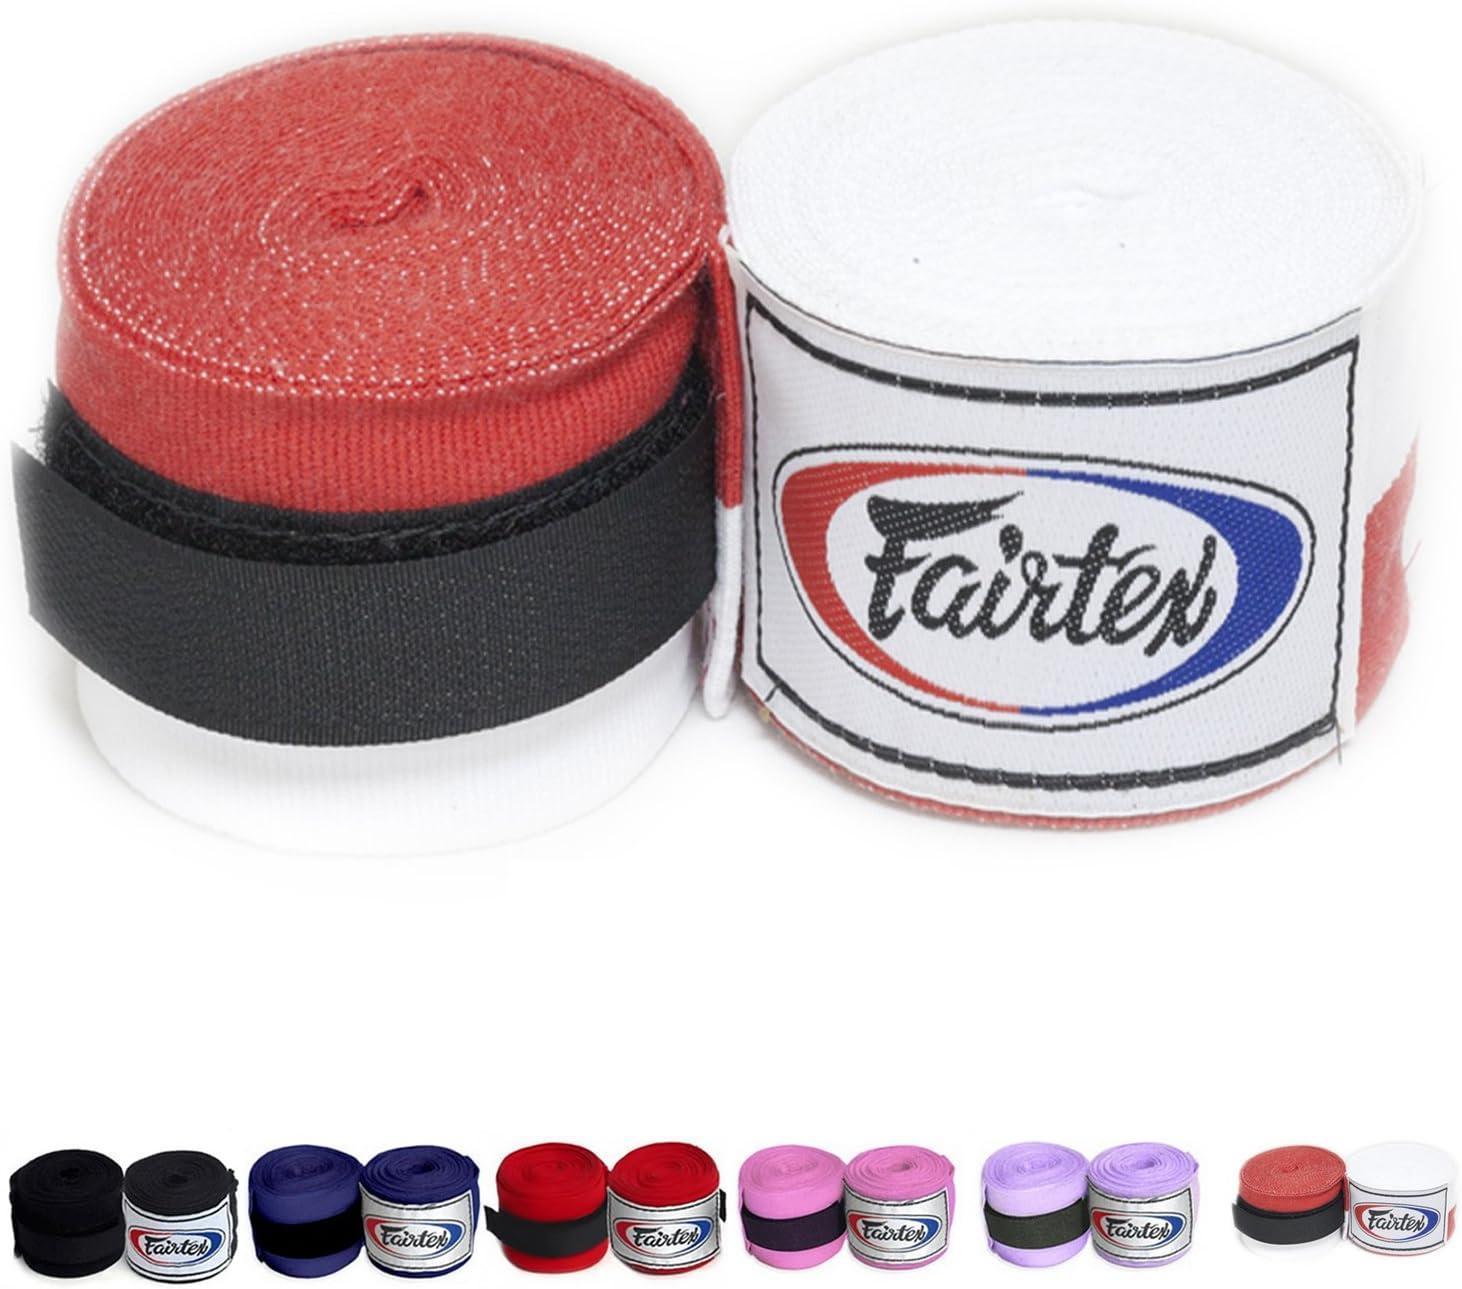 Fairtex Elastic Cotton Handwraps HW2 Wraps Color Max 72% OFF Blea Hand Black Max 61% OFF